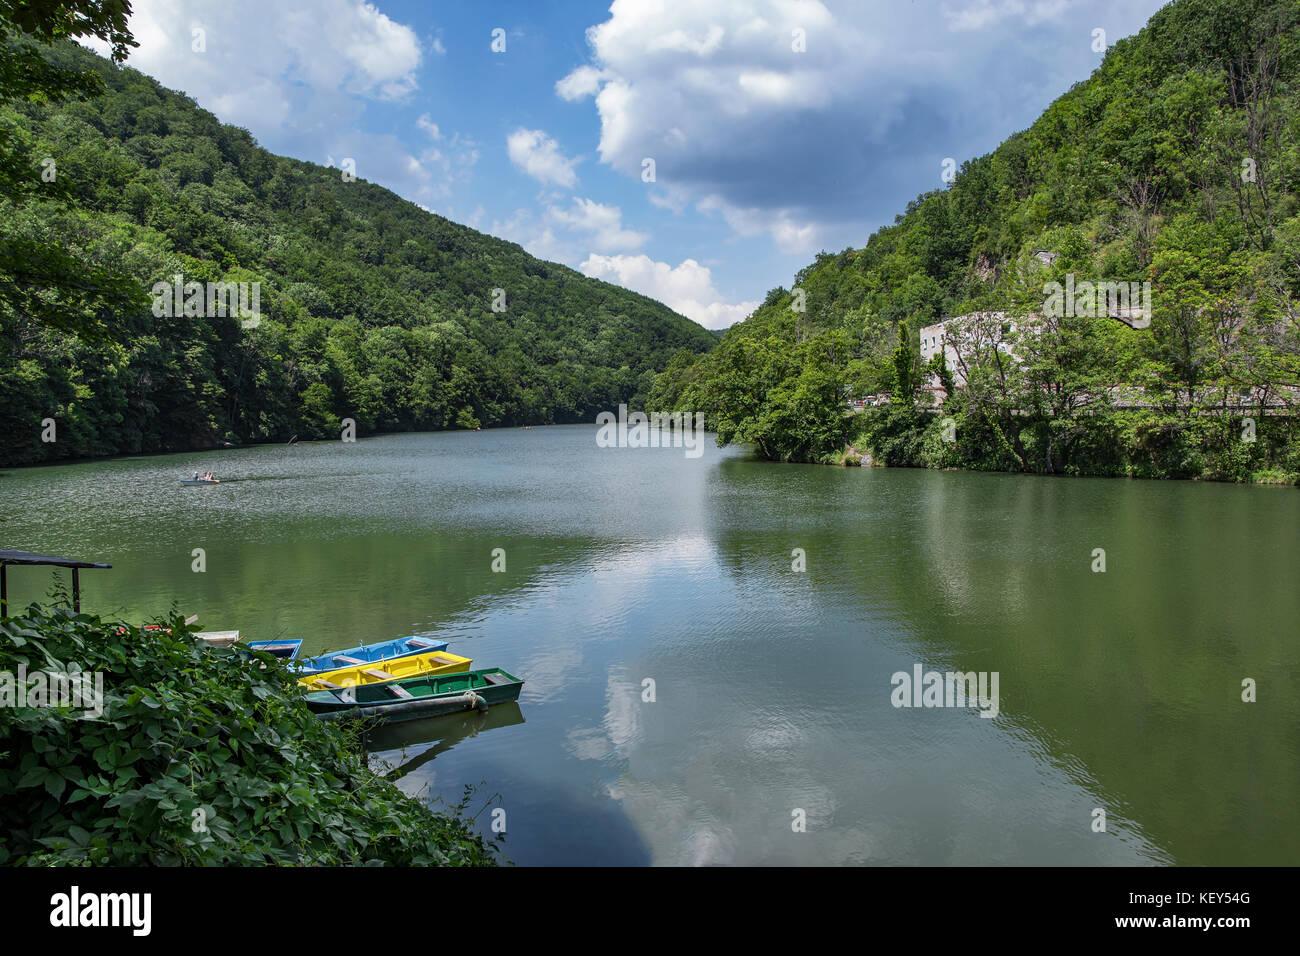 Boating on Lake Hamori in Lillafured, Hungary - Stock Image